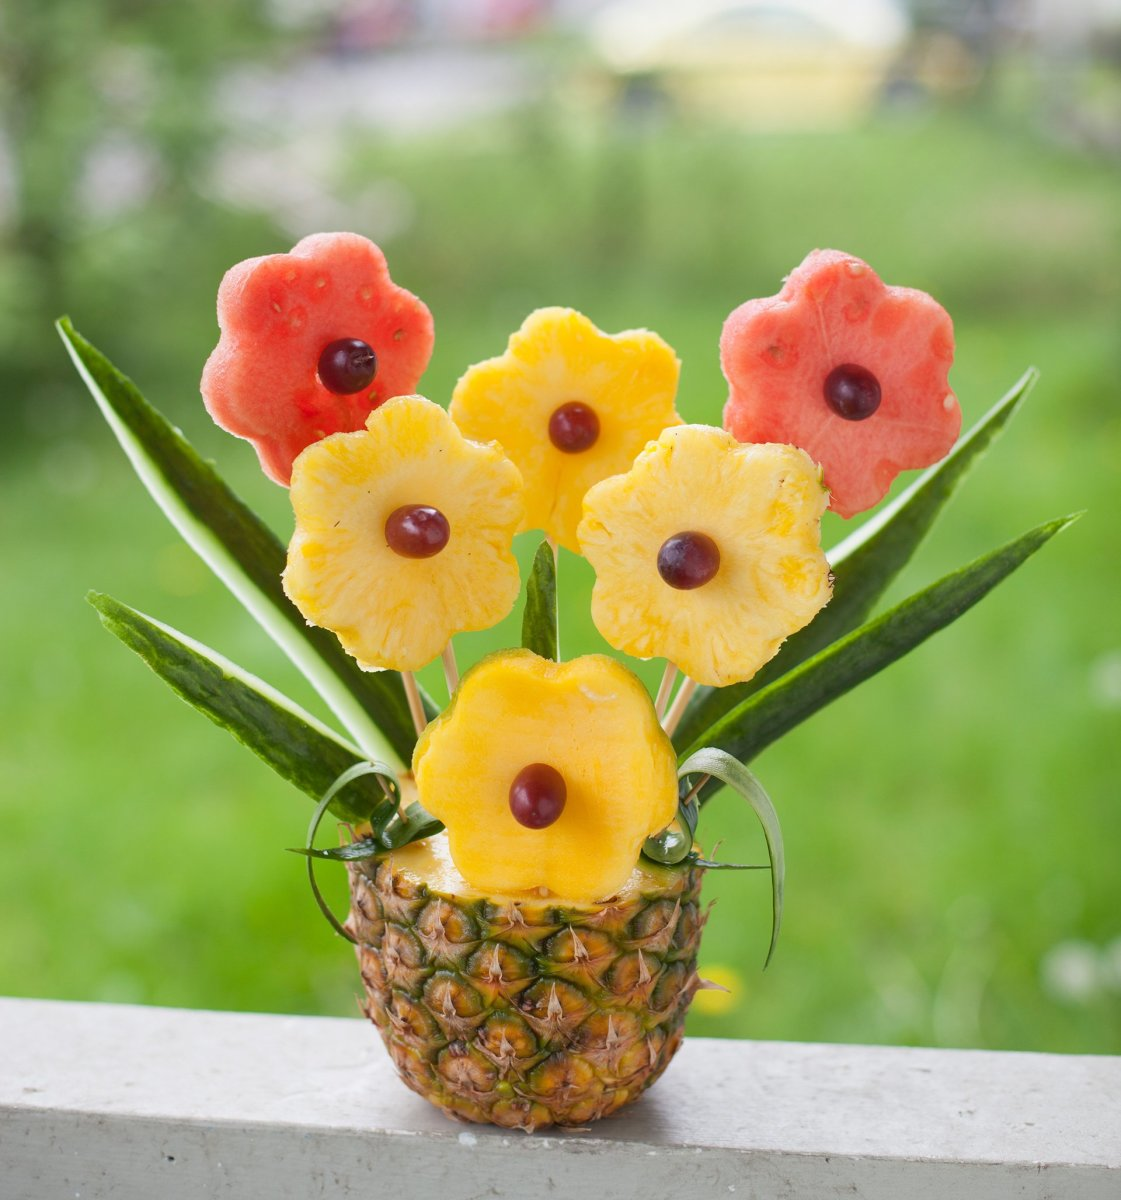 DIY edible fruit arrangement for Mother's Day.